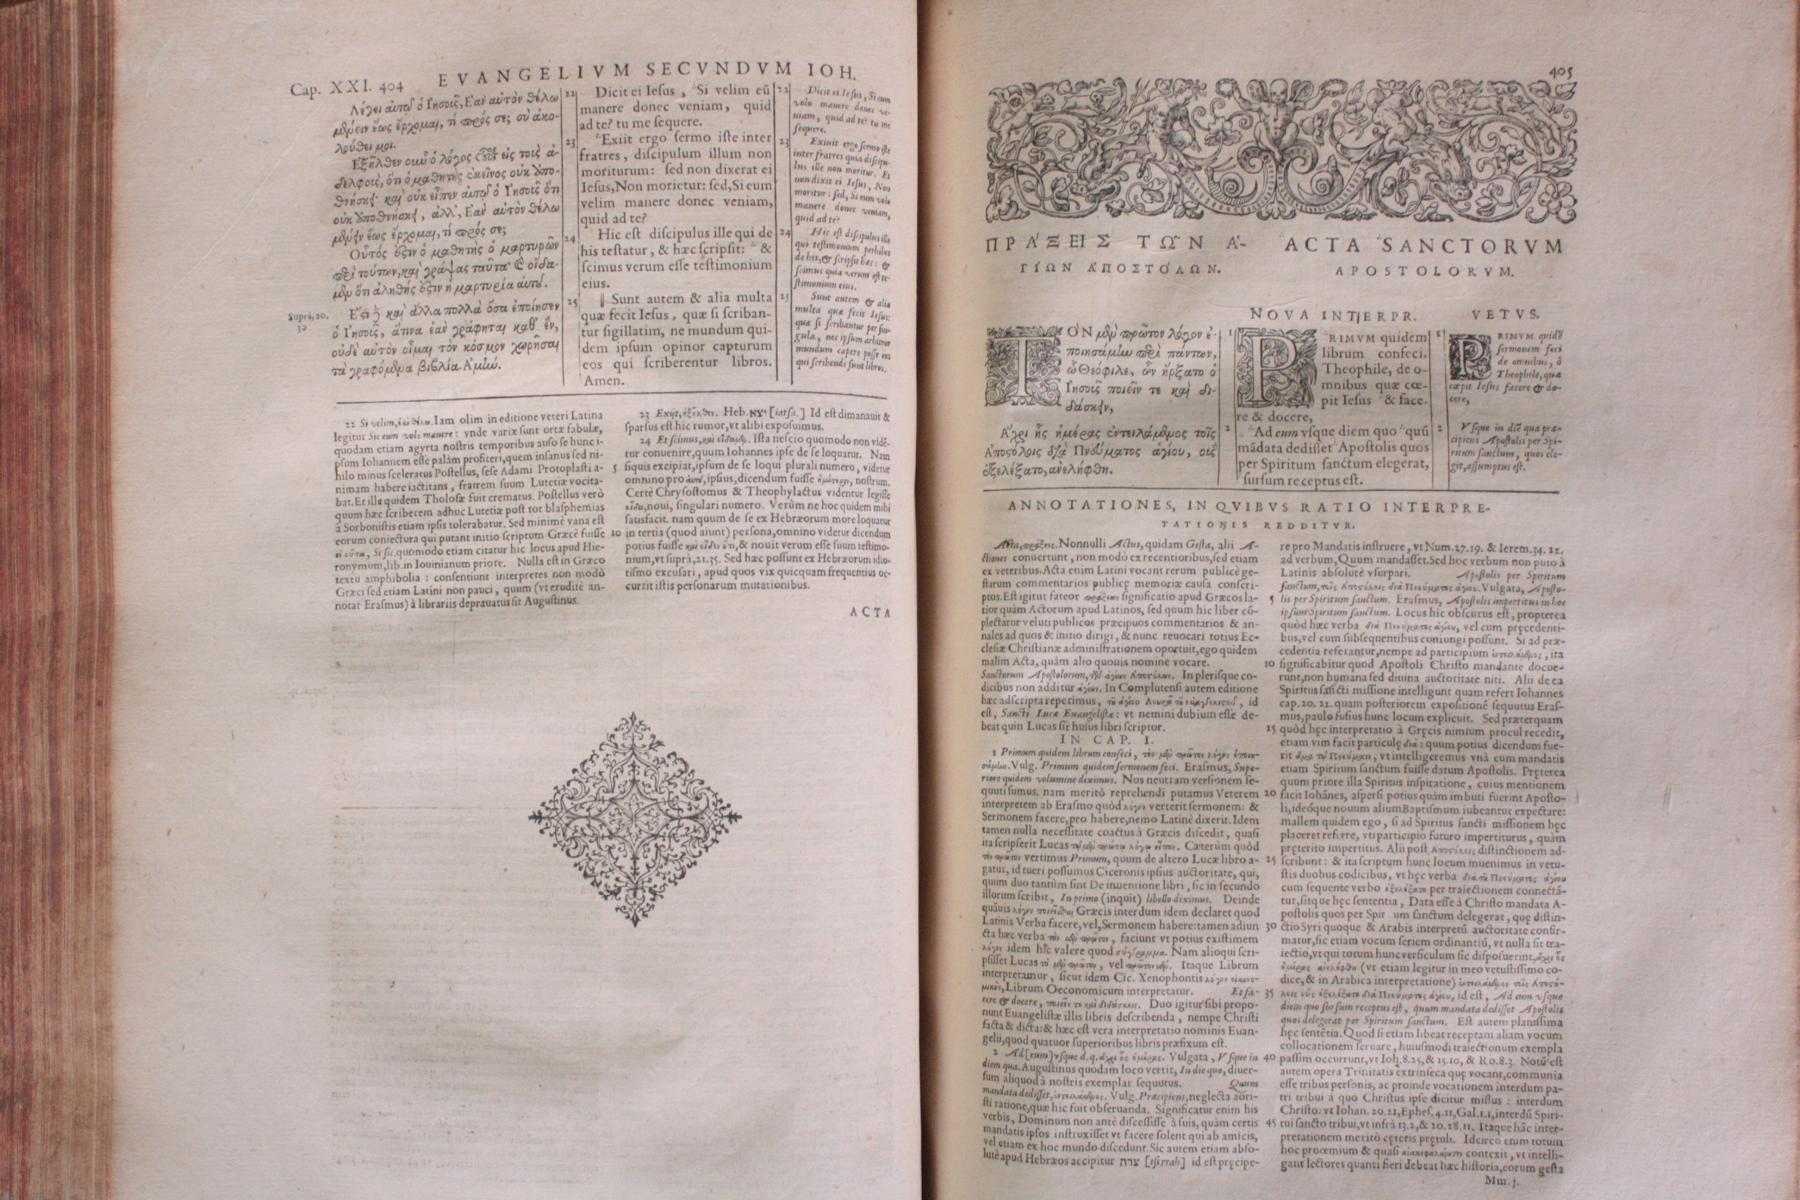 Griechische-Lateinische Bibel, Novum Testamentum 1582-9